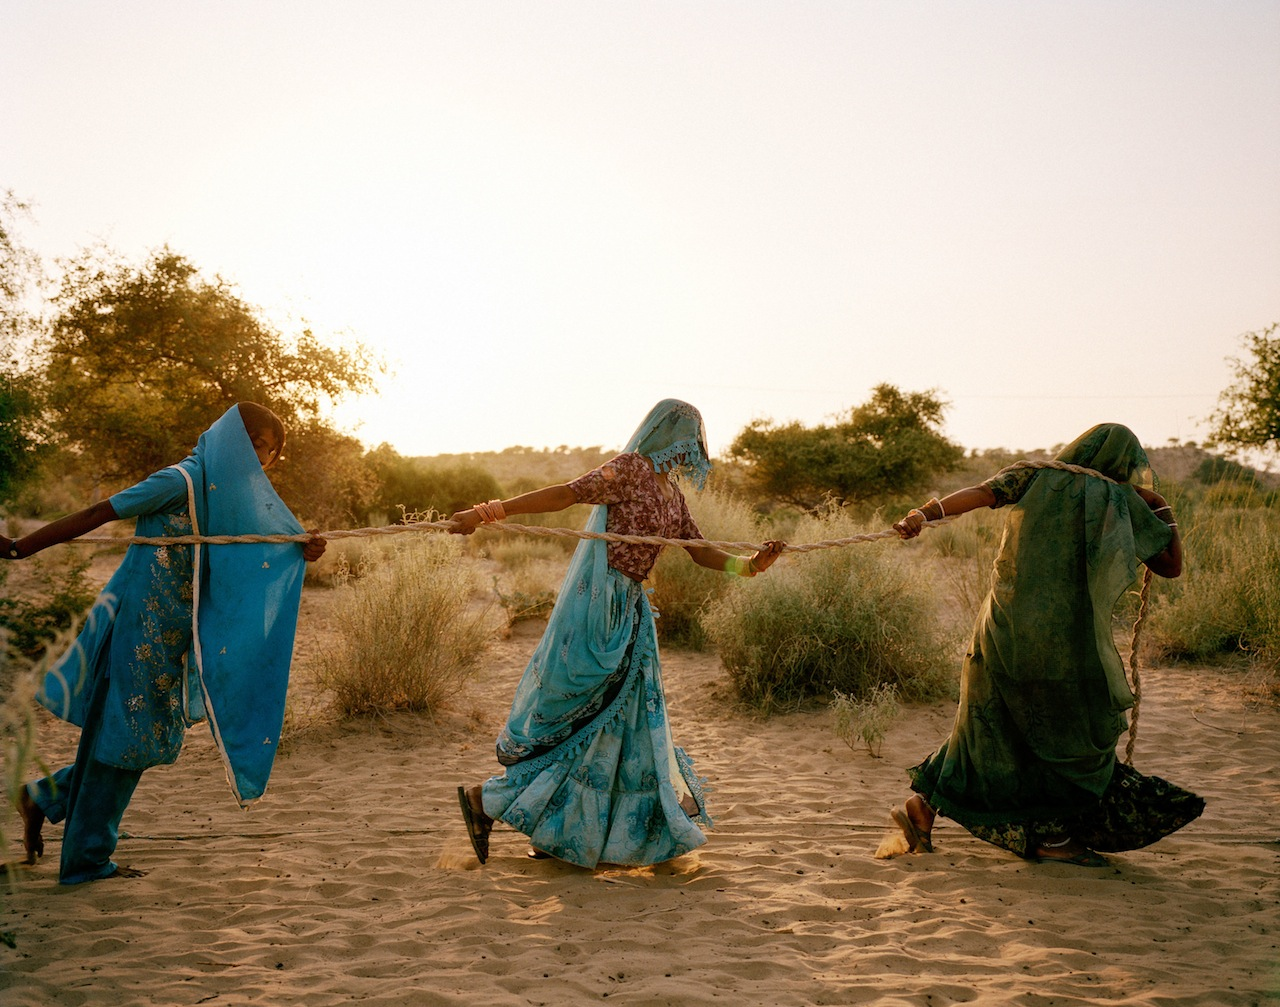 Mustafah Abdulaziz, 'Pulling of the well', 2013, Tharpakar, Pakistan